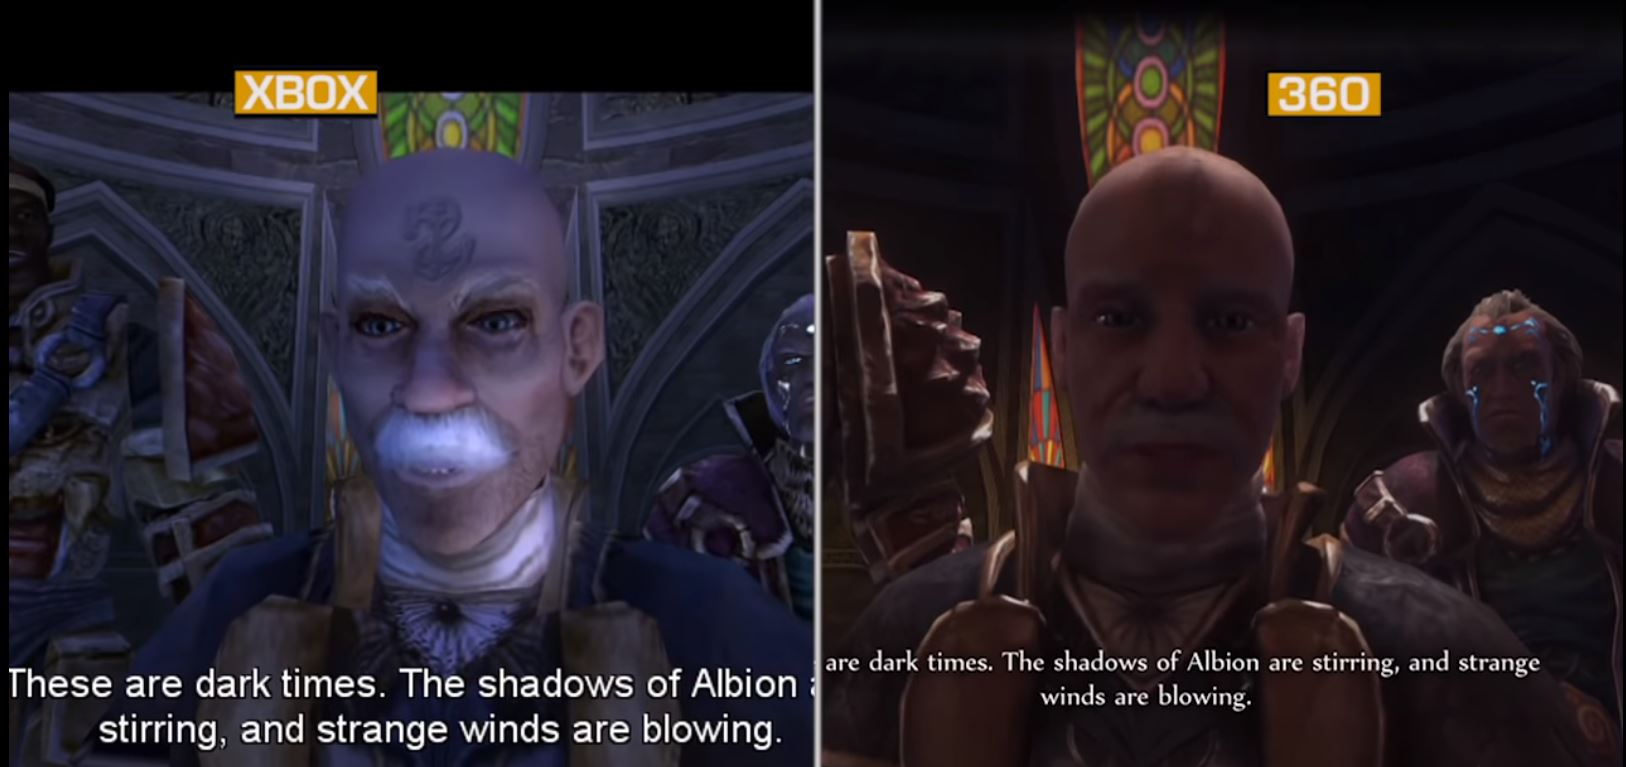 Fable (Xbox) and Fable Anniversary Edition (X360) Comparison